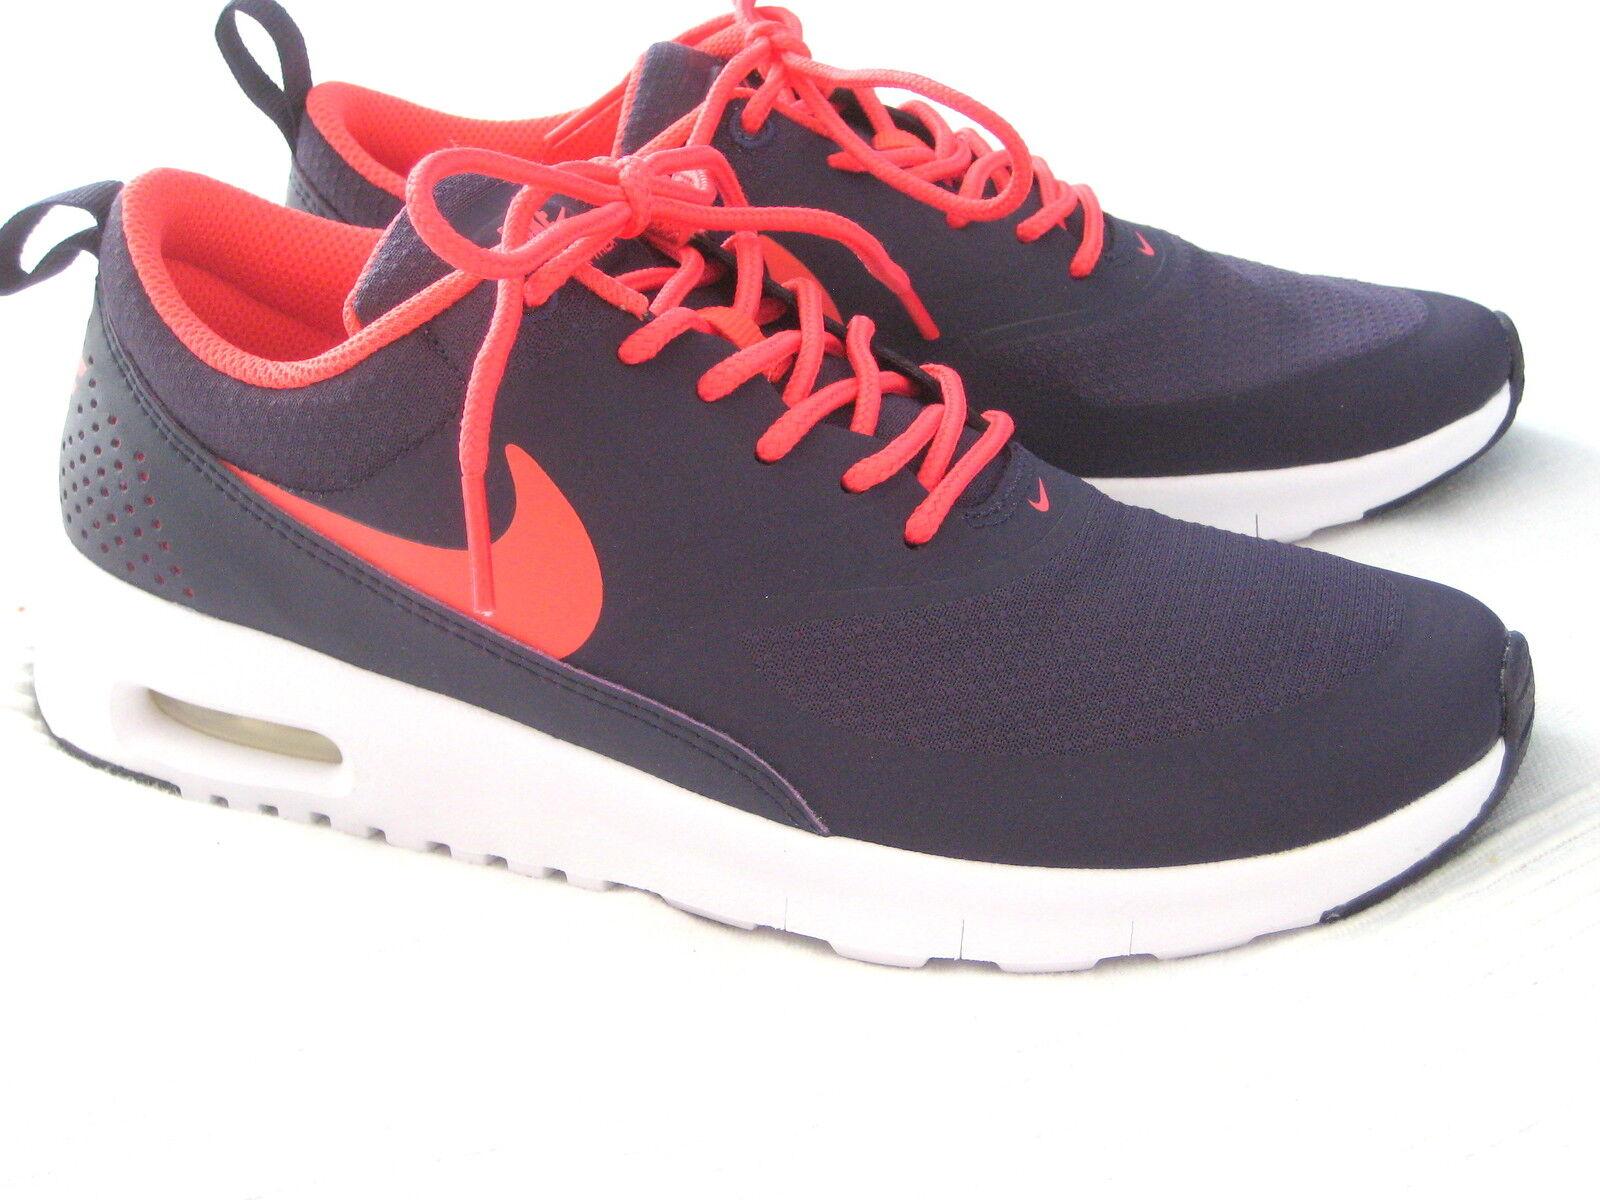 Nike Zapatillas Air Max Thea cortos cortos cortos púrpura púrpura púrpura talla 38 38,5 nuevo embalaje original zapatos  salida de fábrica